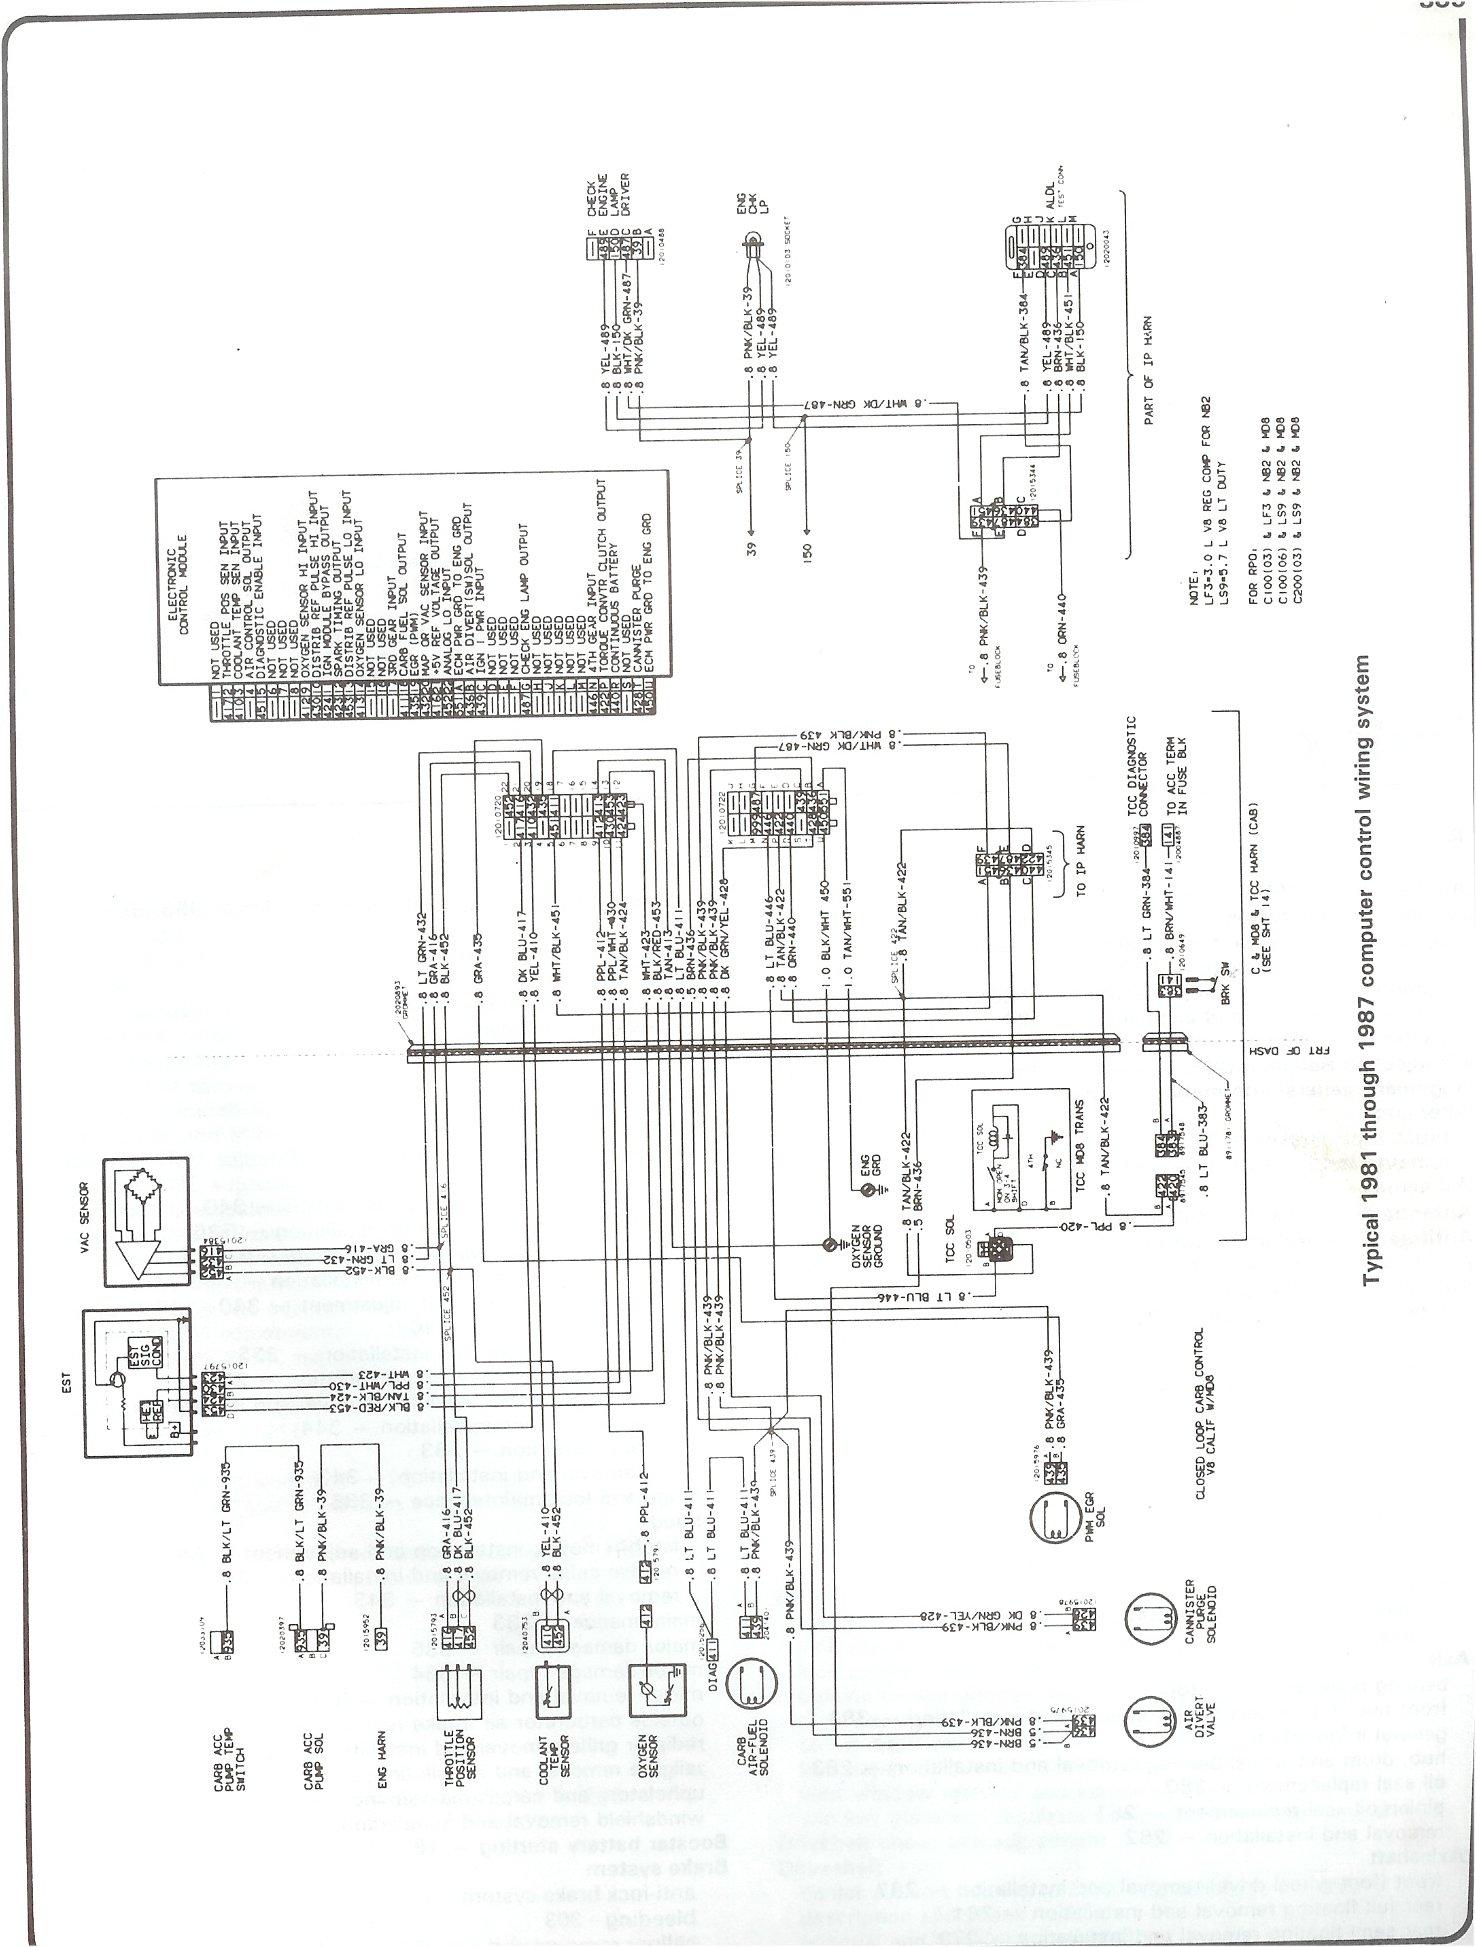 K5 Blazer Wiring Harness - Wiring Diagram Name - 1985 Chevy Truck Wiring Diagram